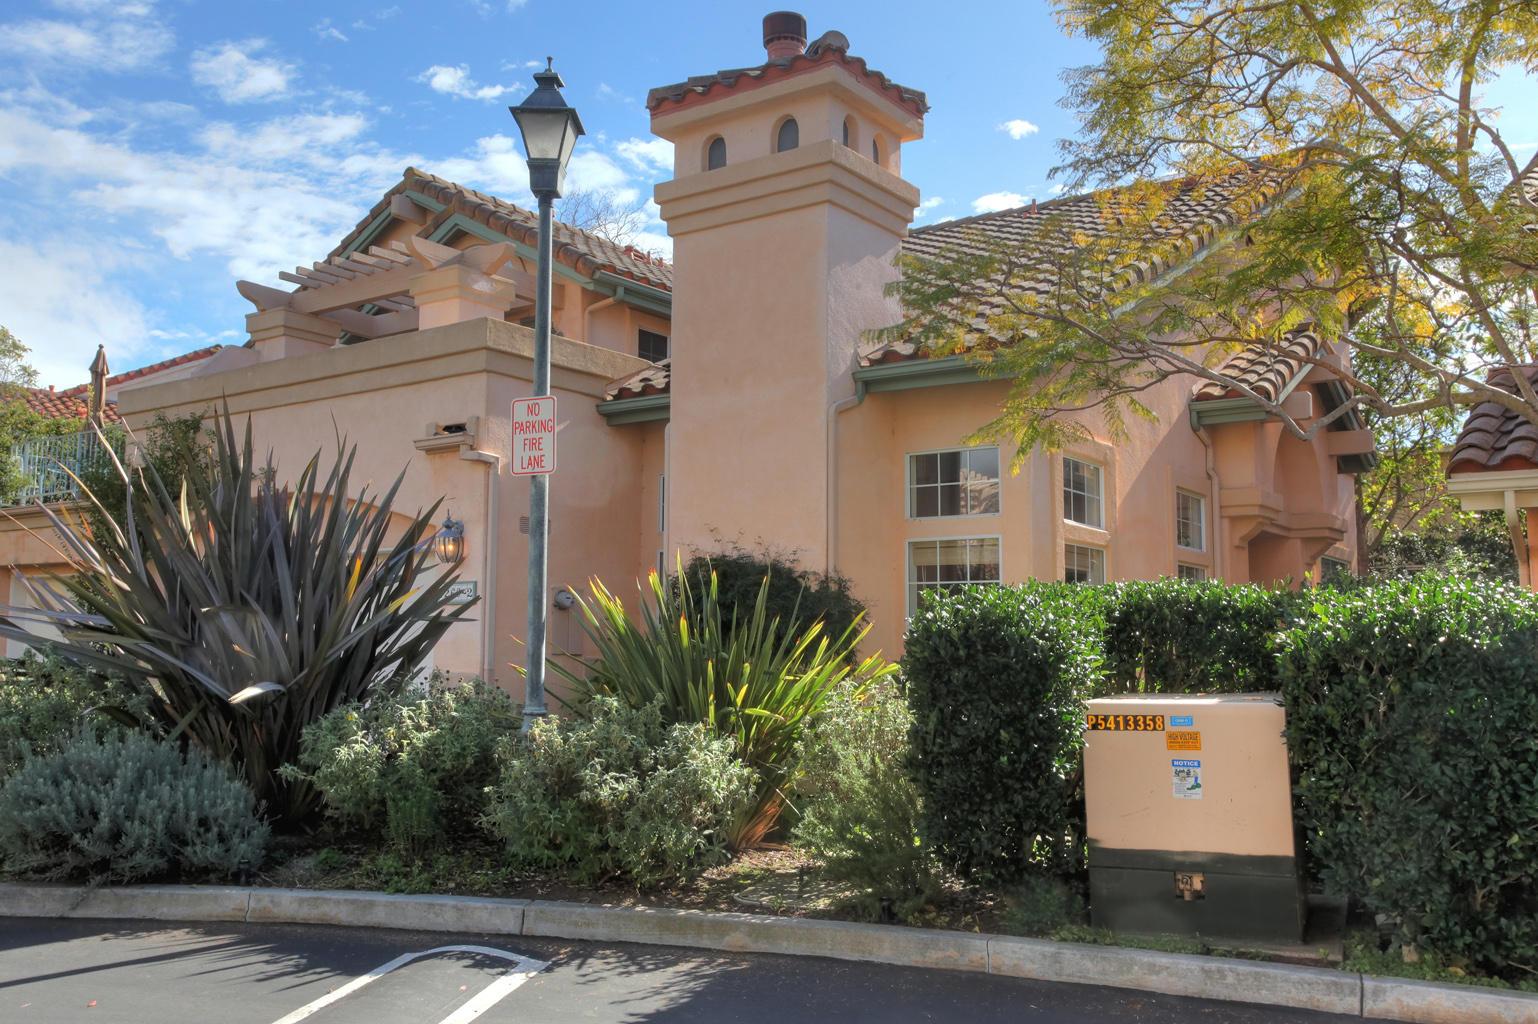 Property photo for 1266 Cravens Ln #2 Carpinteria, California 93013 - 16-339